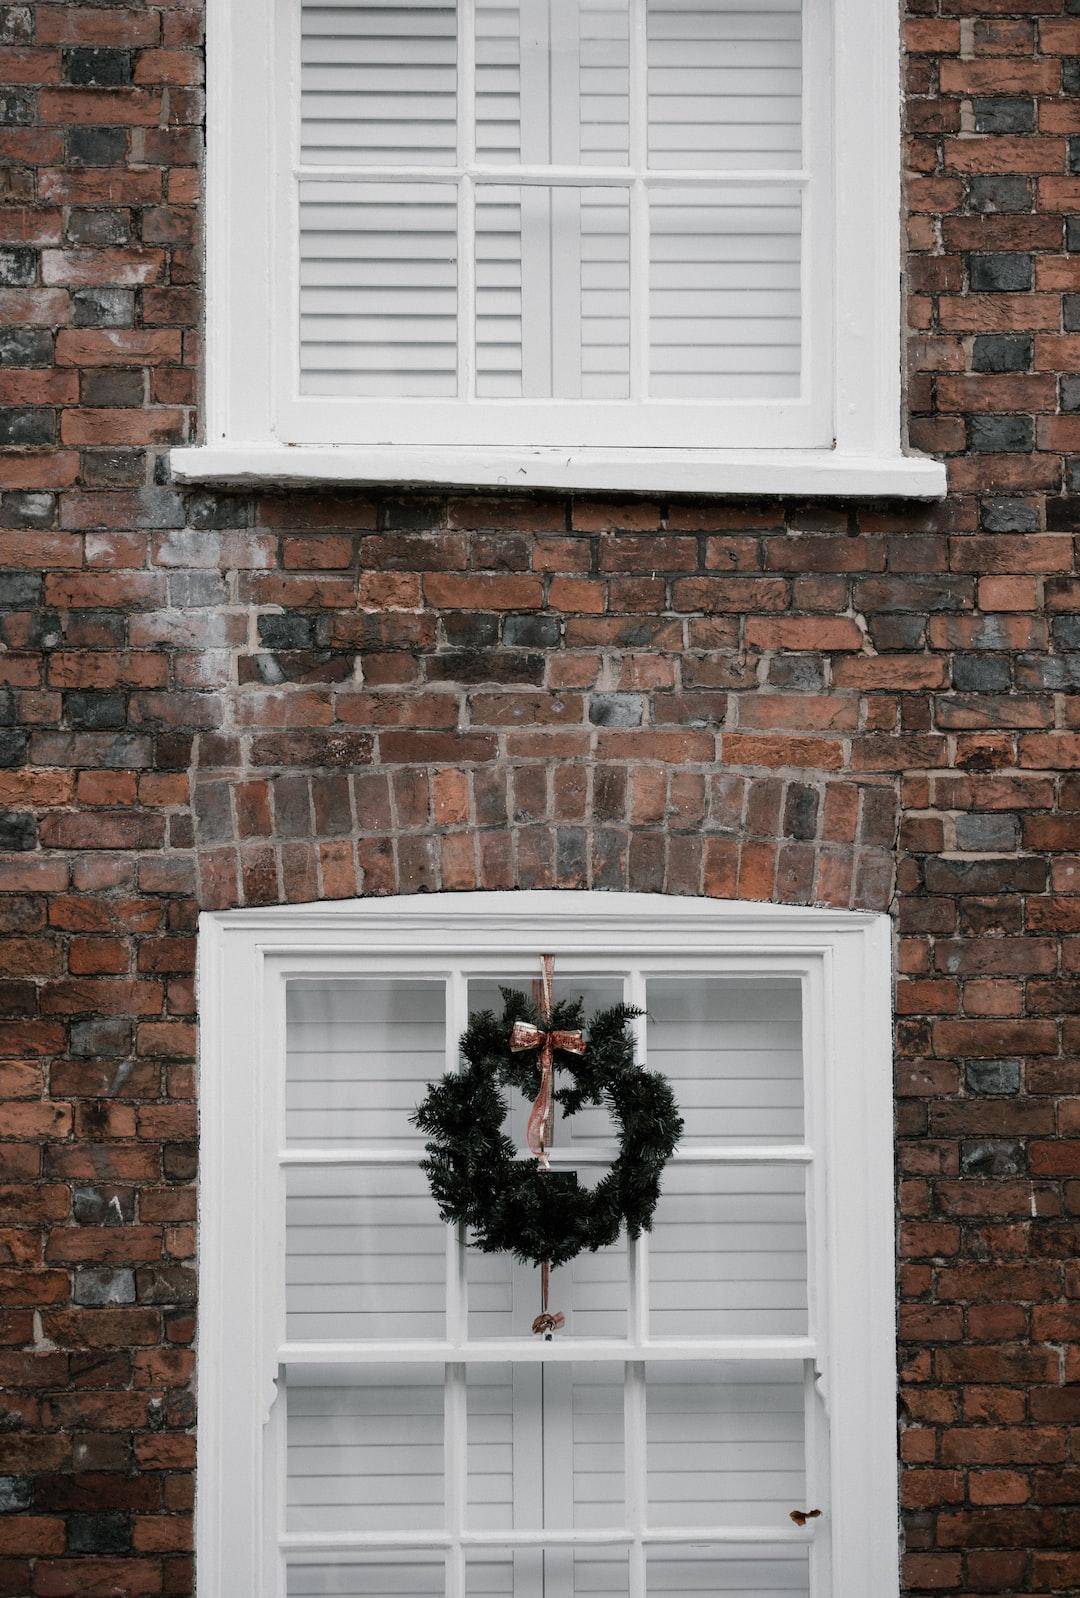 Christmas Wreath in Window